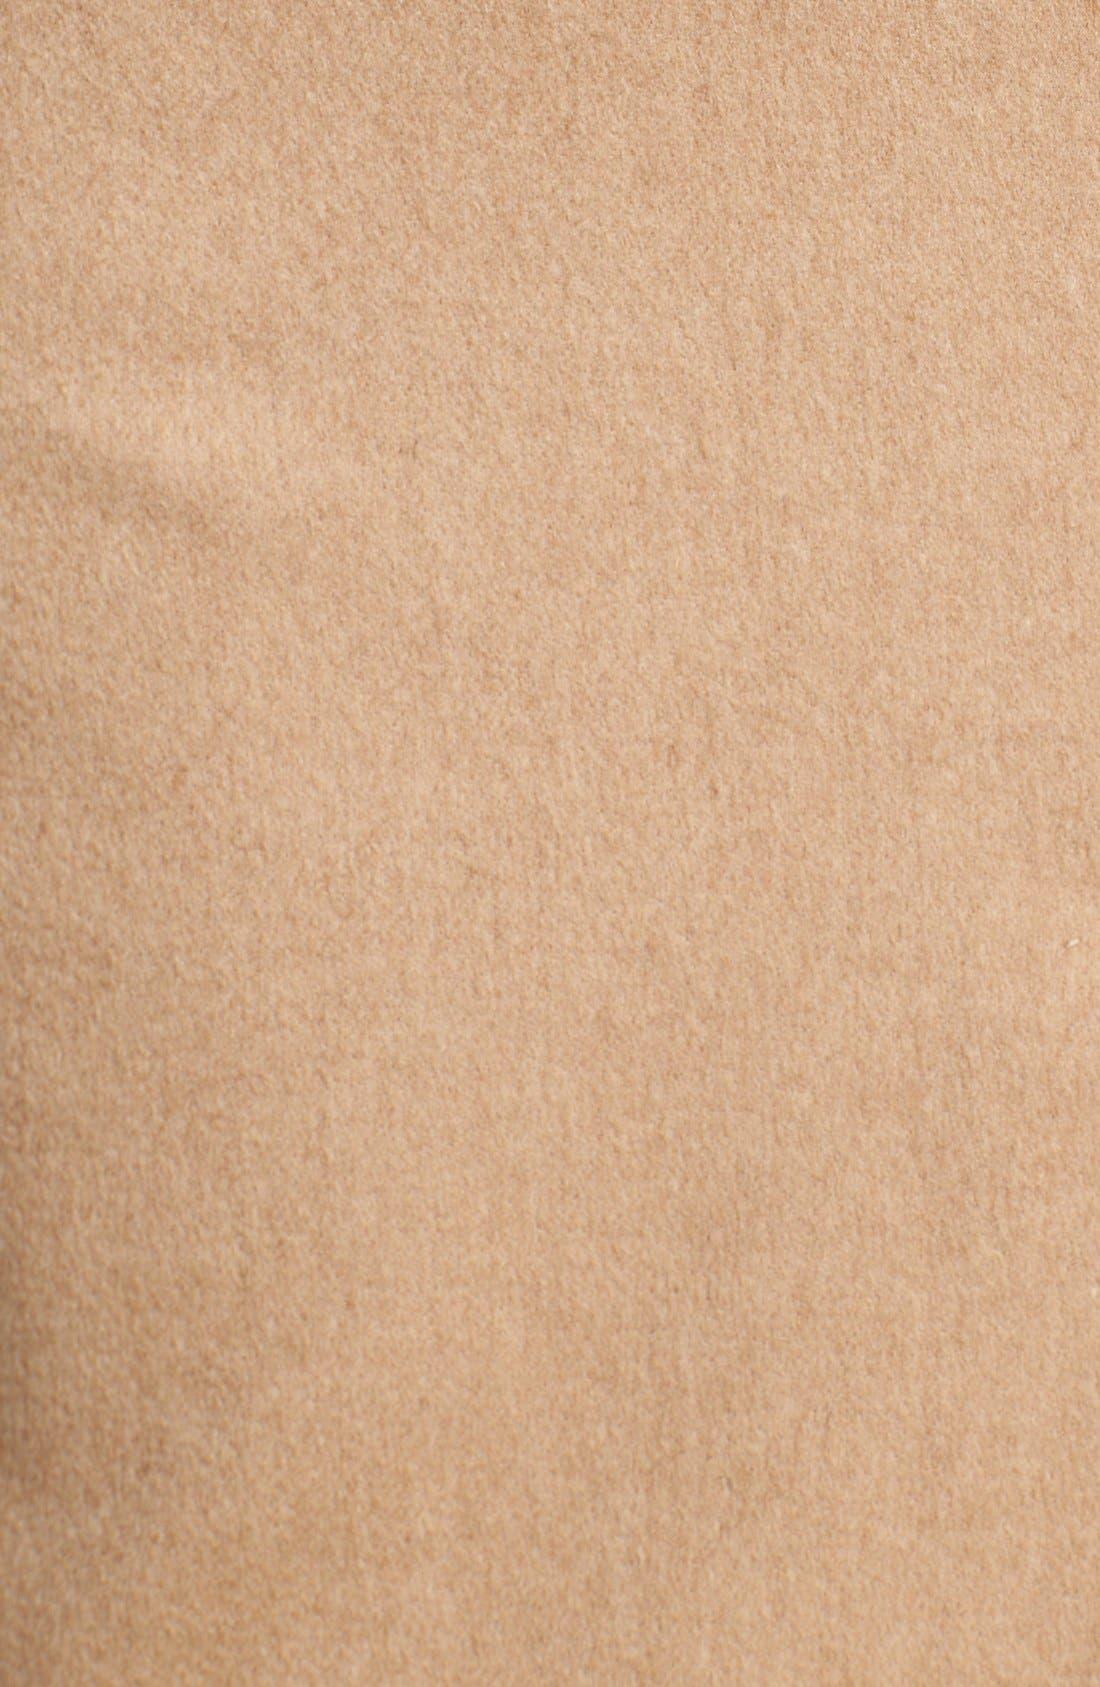 Alternate Image 3  - Max Mara 'Sargano' Camel Hair Pencil Skirt